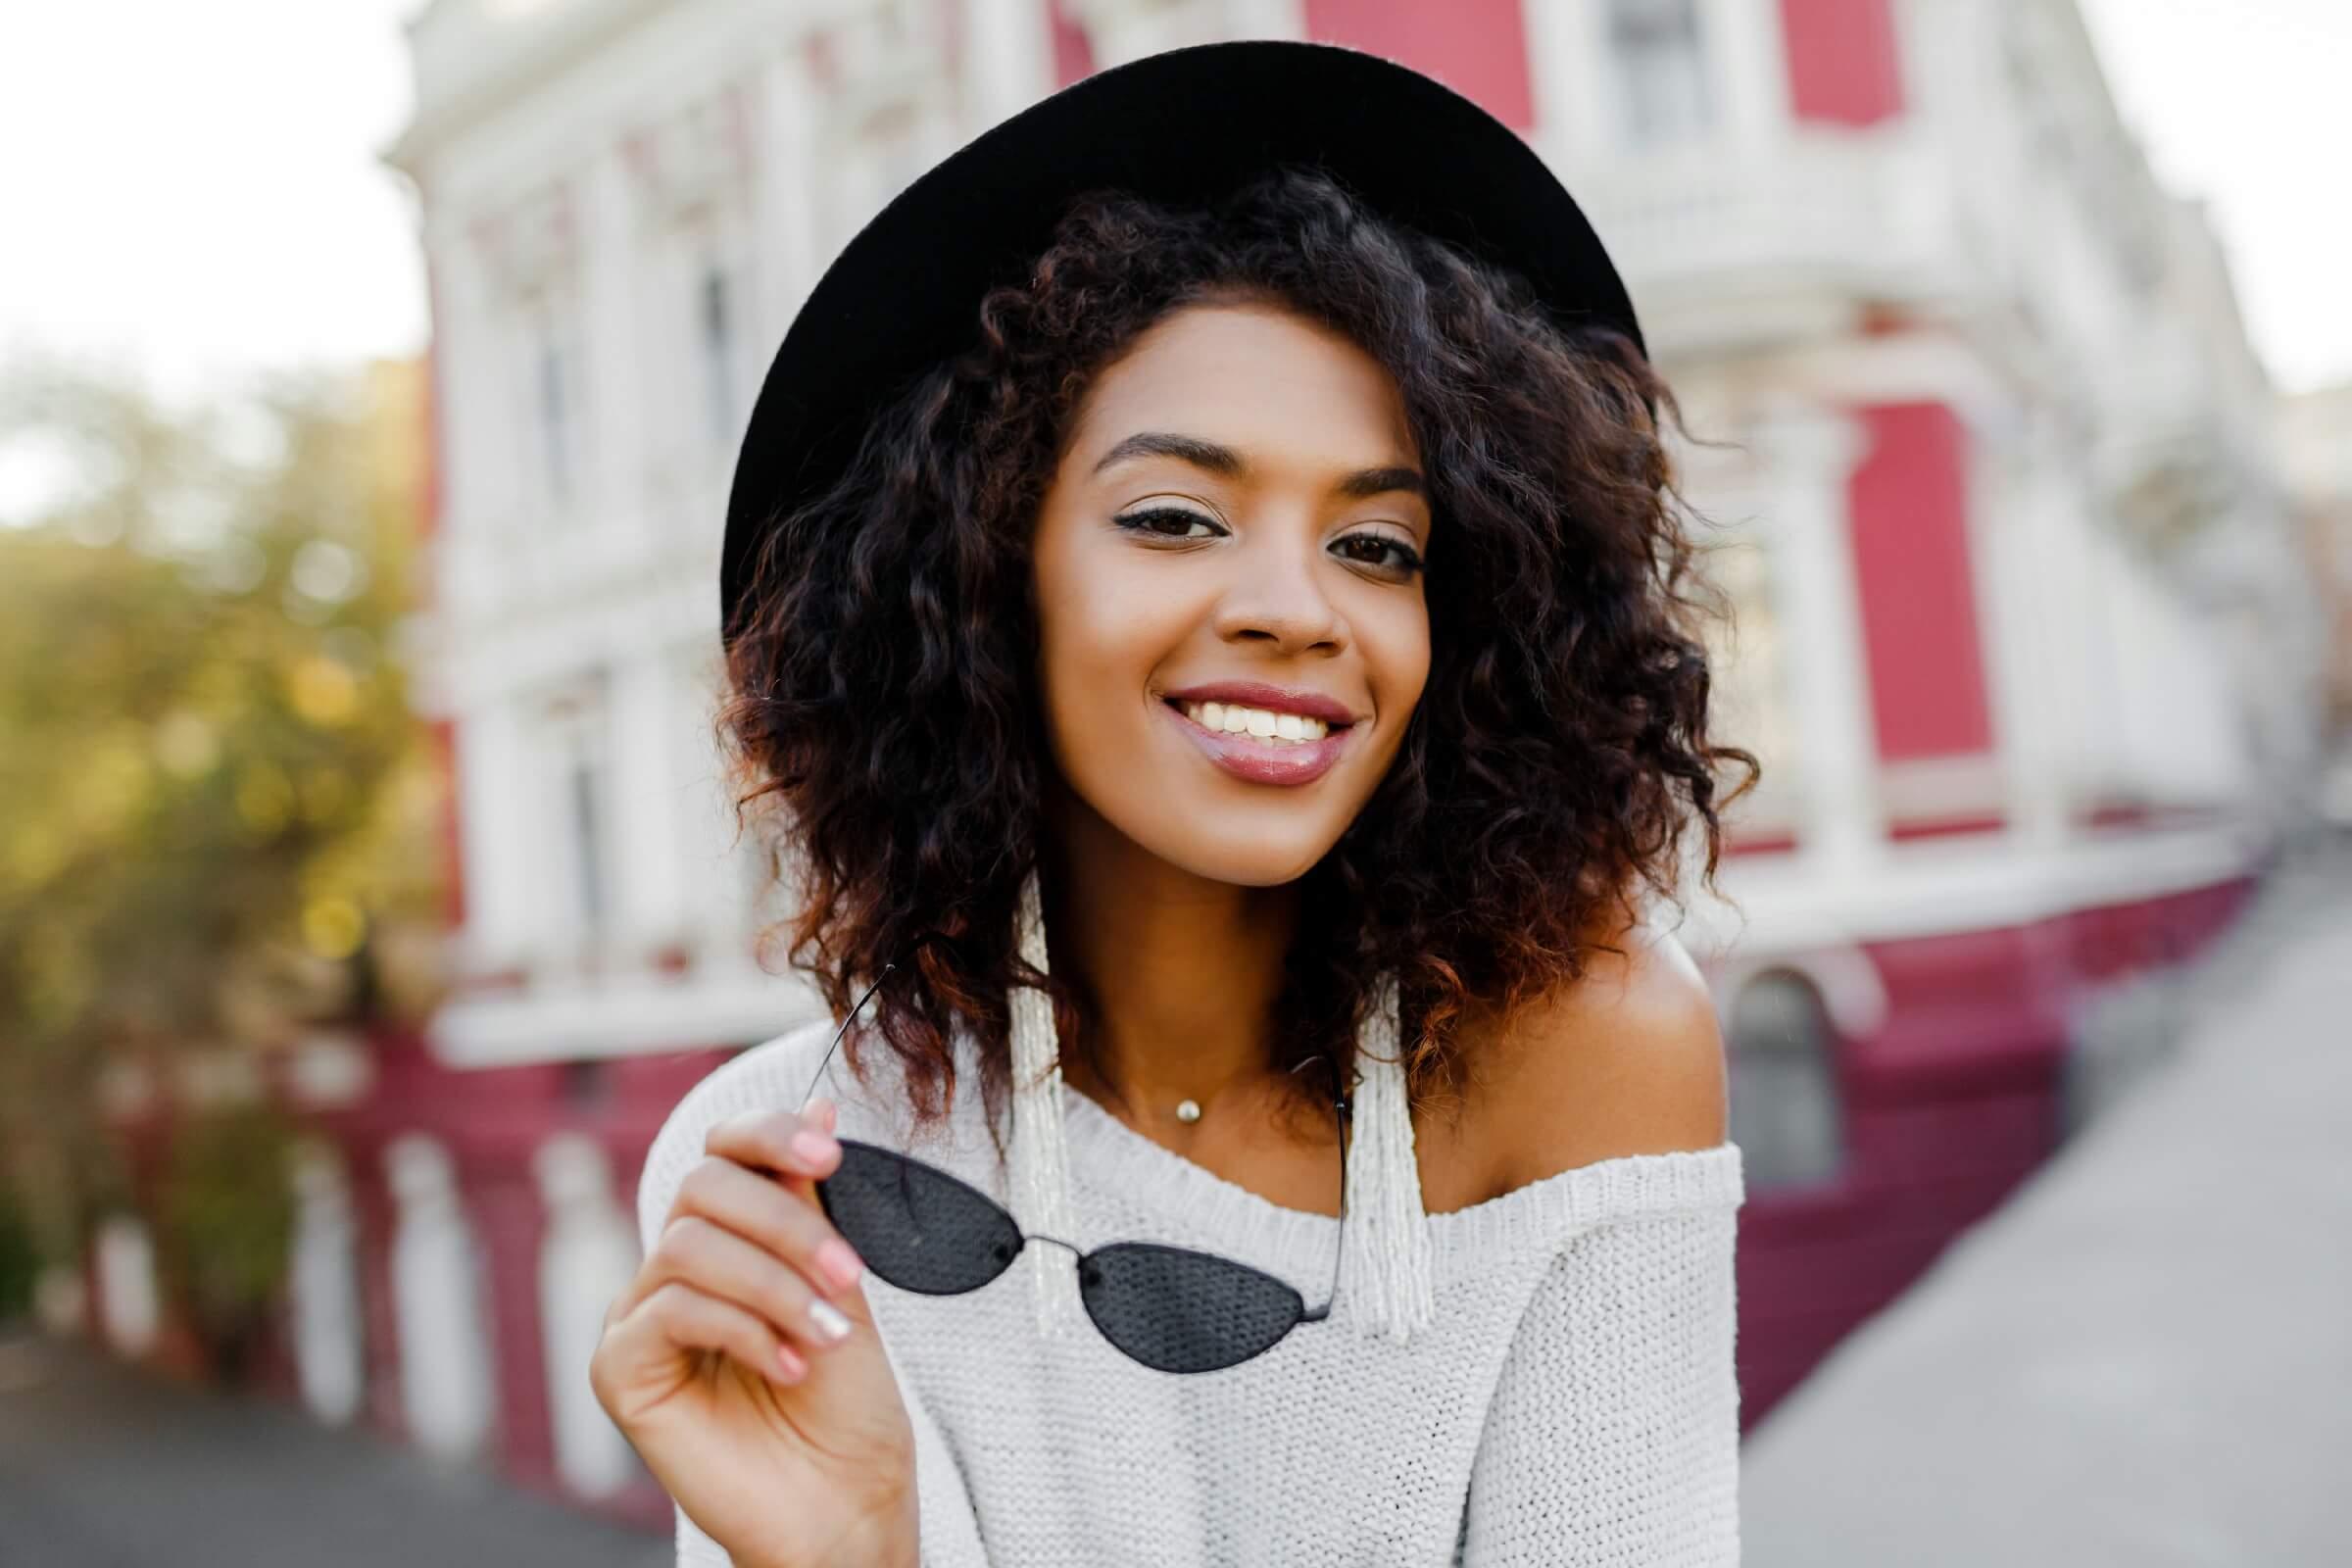 Makeup for Dark Skin From Professional Makeup Artist